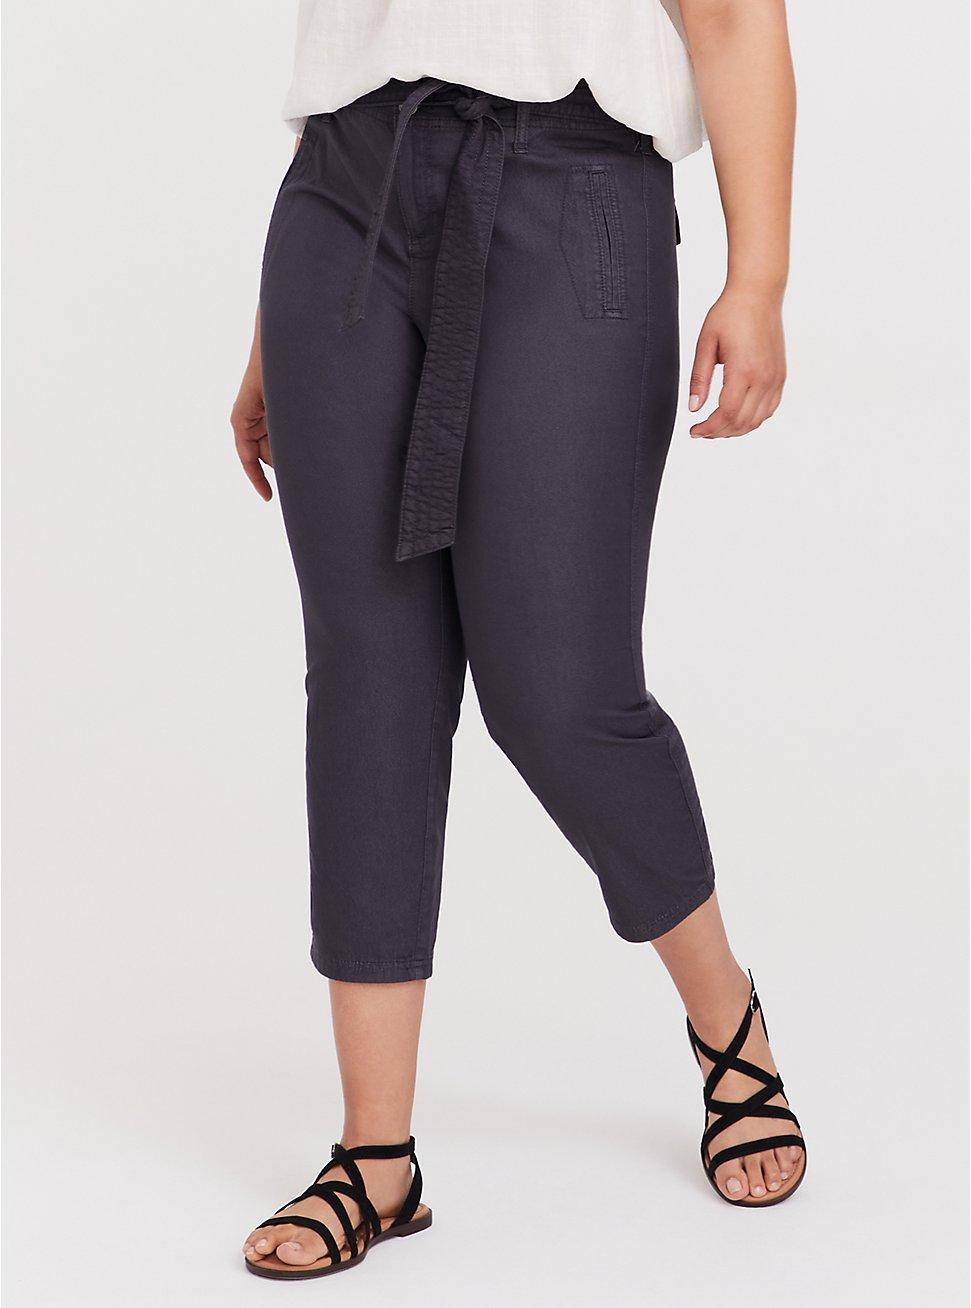 Plus Size Crop Twill Self Tie Utility Pant – Dark Slate Grey, , hi-res